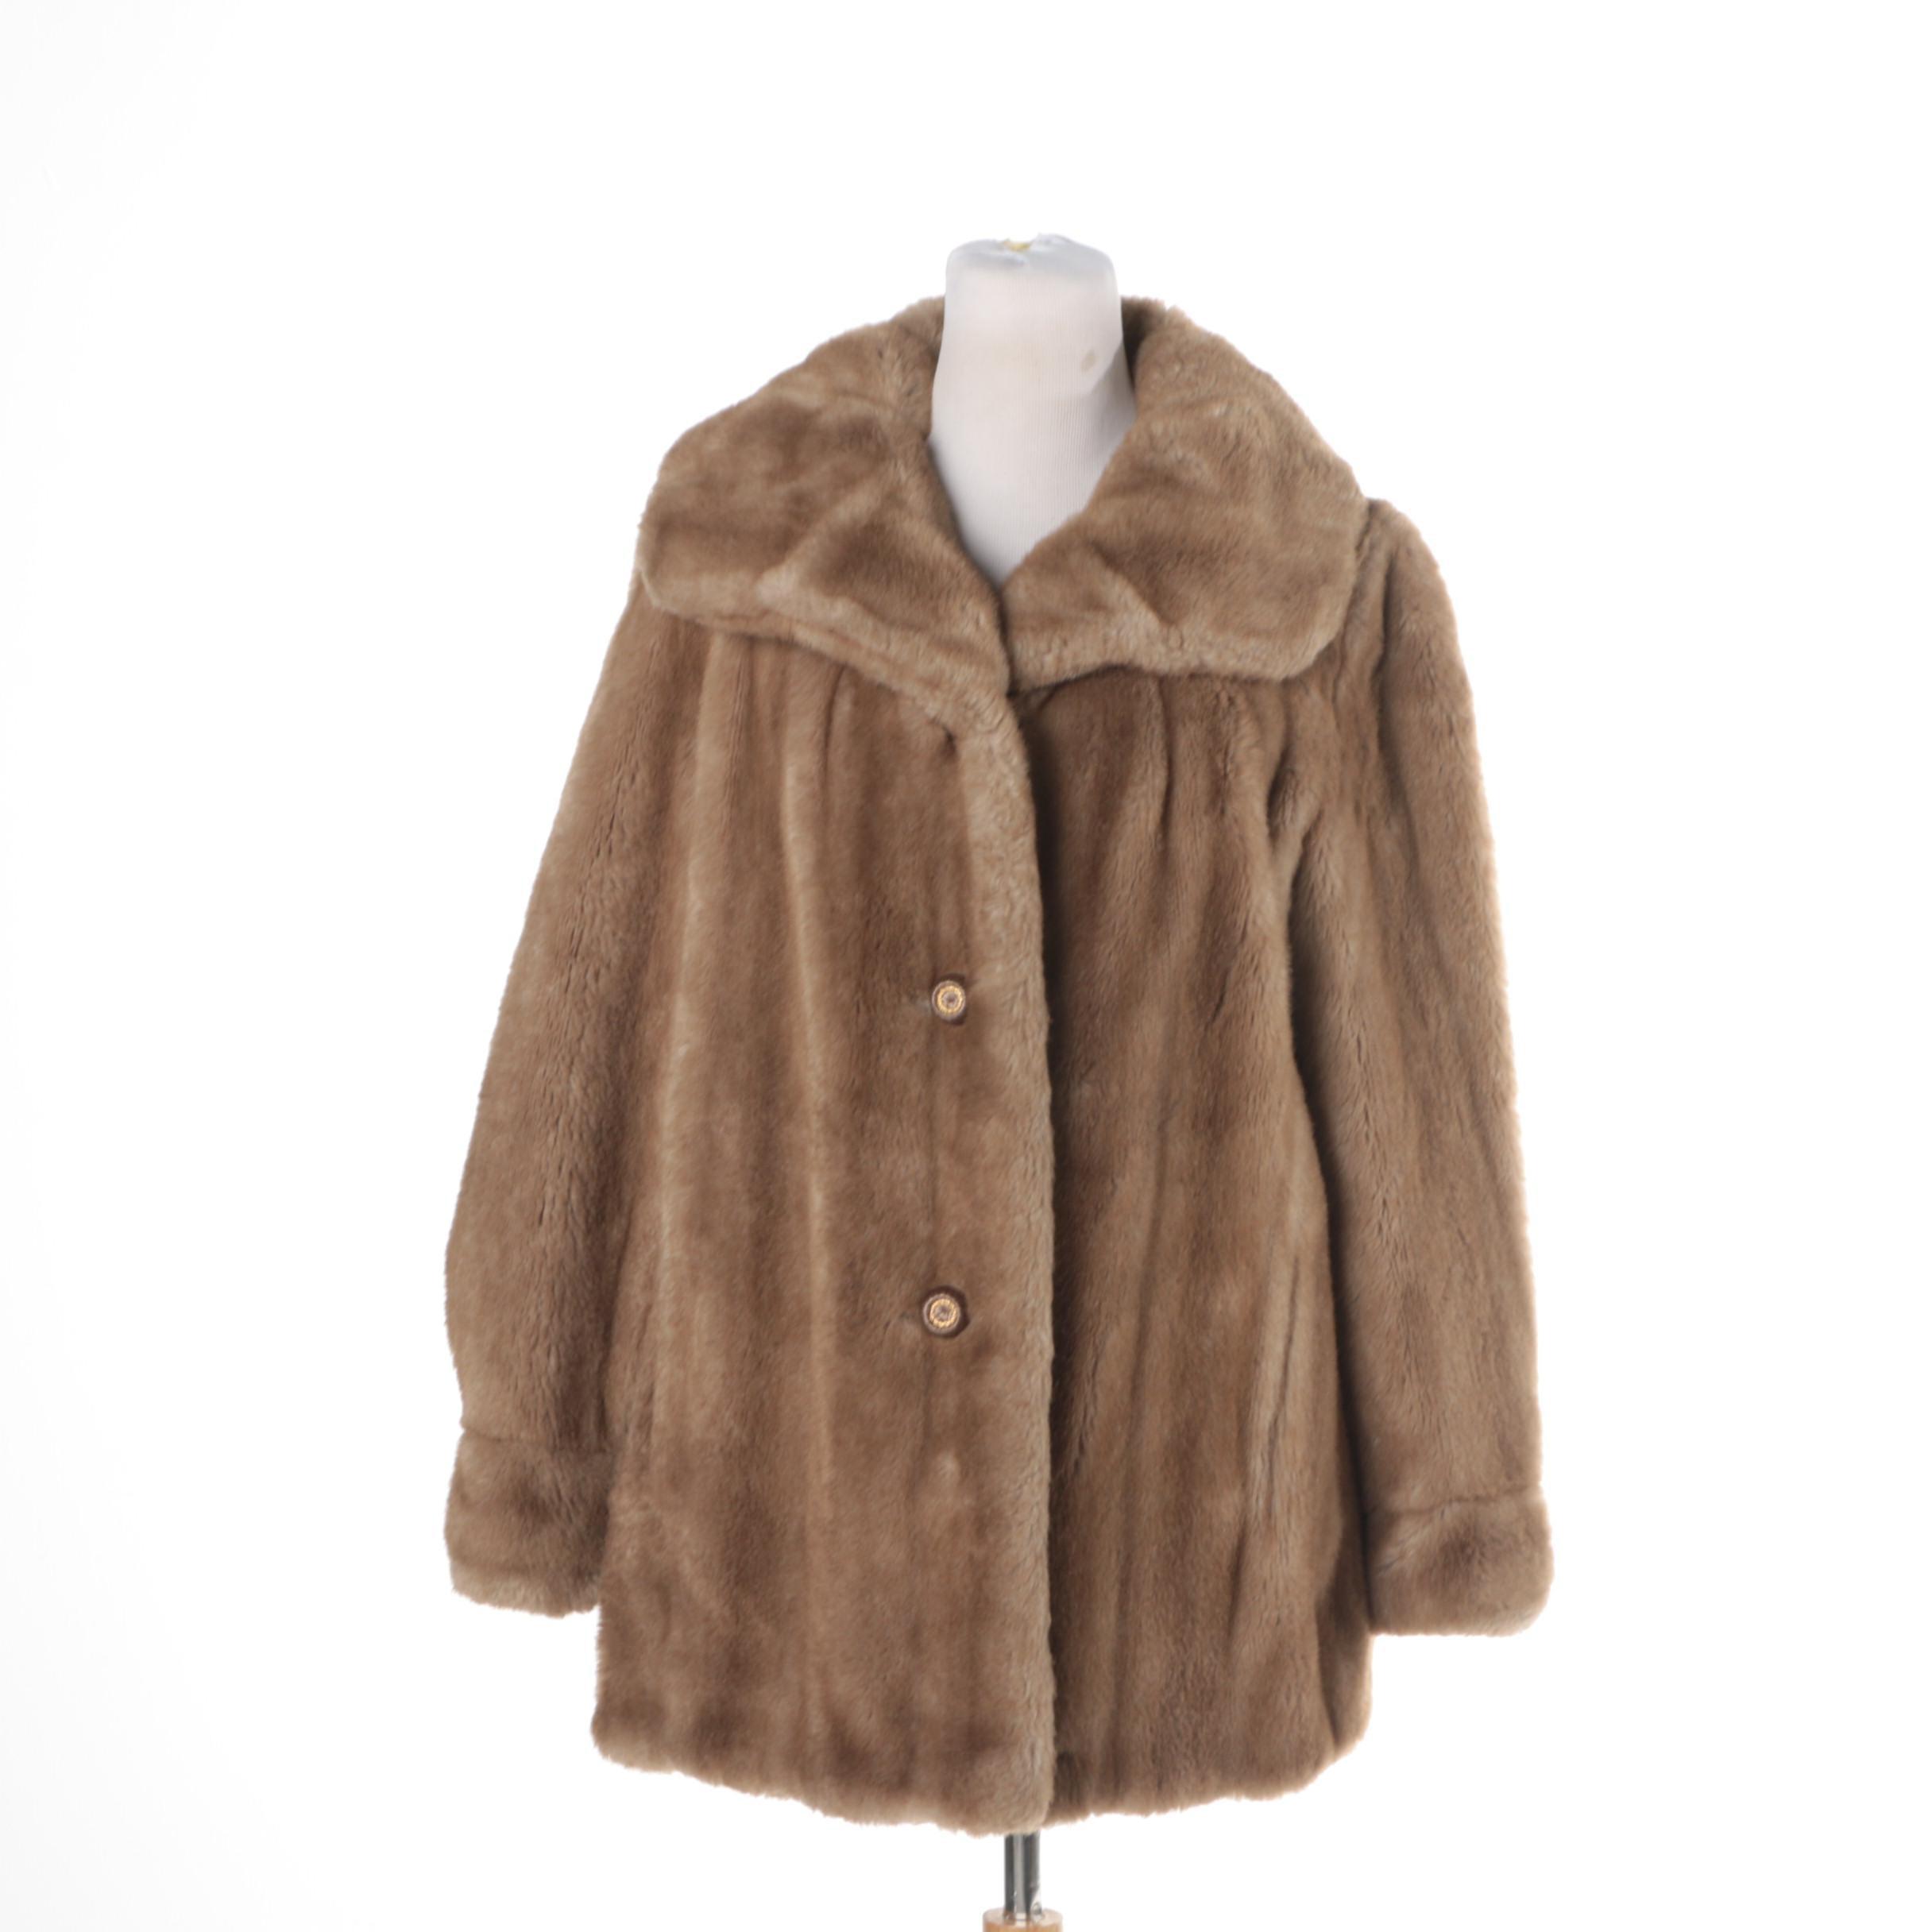 Women's Vintage Grandella Faux Fur Coat